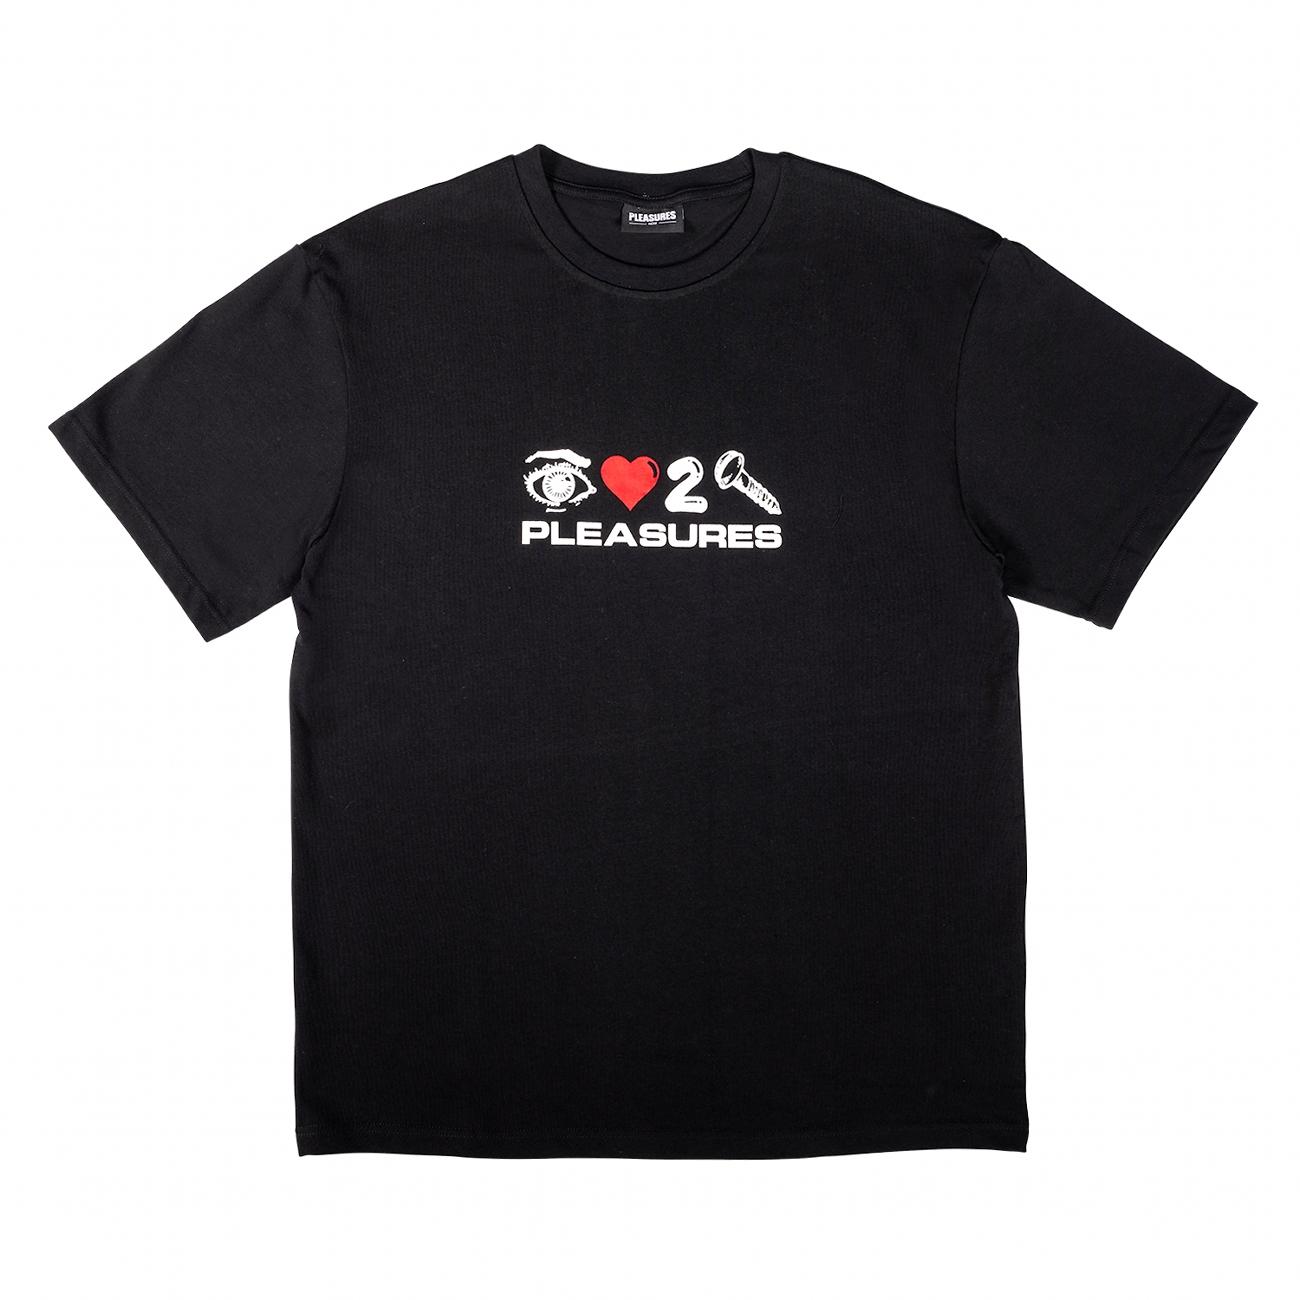 【PLEASURES/プレジャーズ】SCREW OVERSIZED HEAVY WEIGHT SHIRT カットソーTシャツ / BLACK